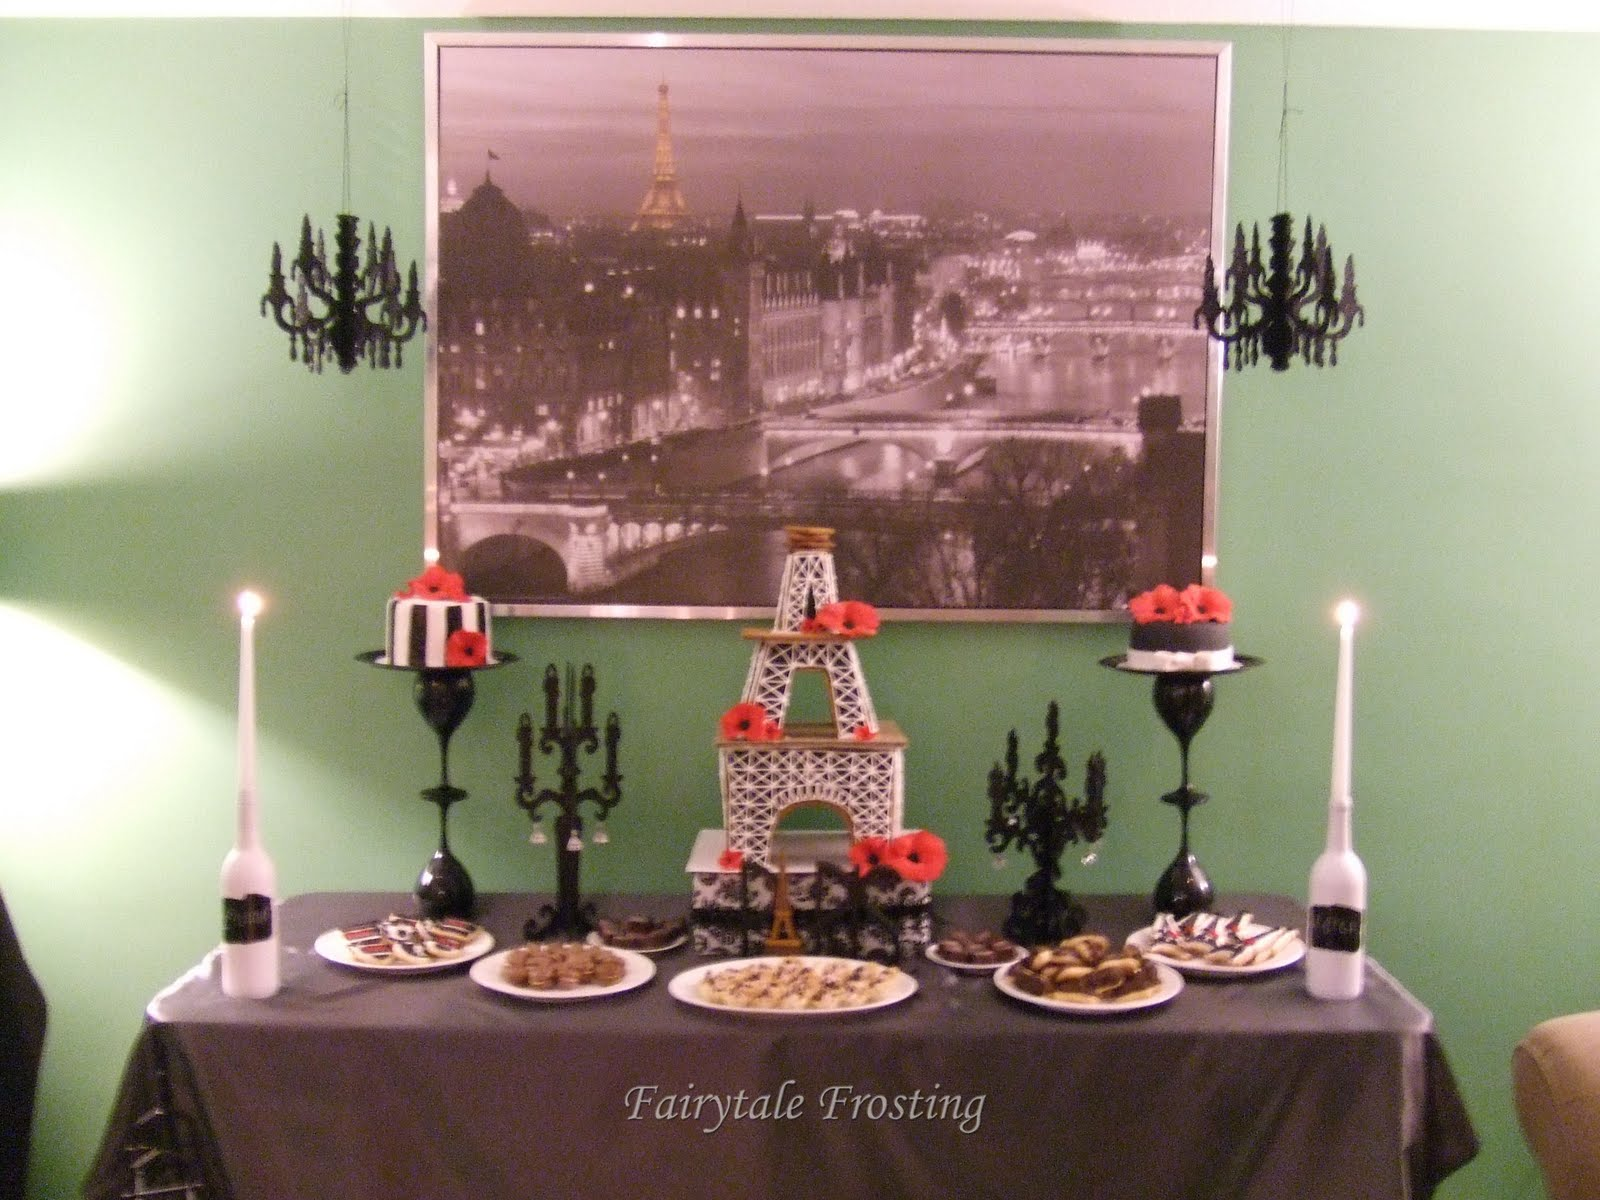 Swanky Parisian Soiree & Fairytale Frosting: Swanky Parisian Soiree